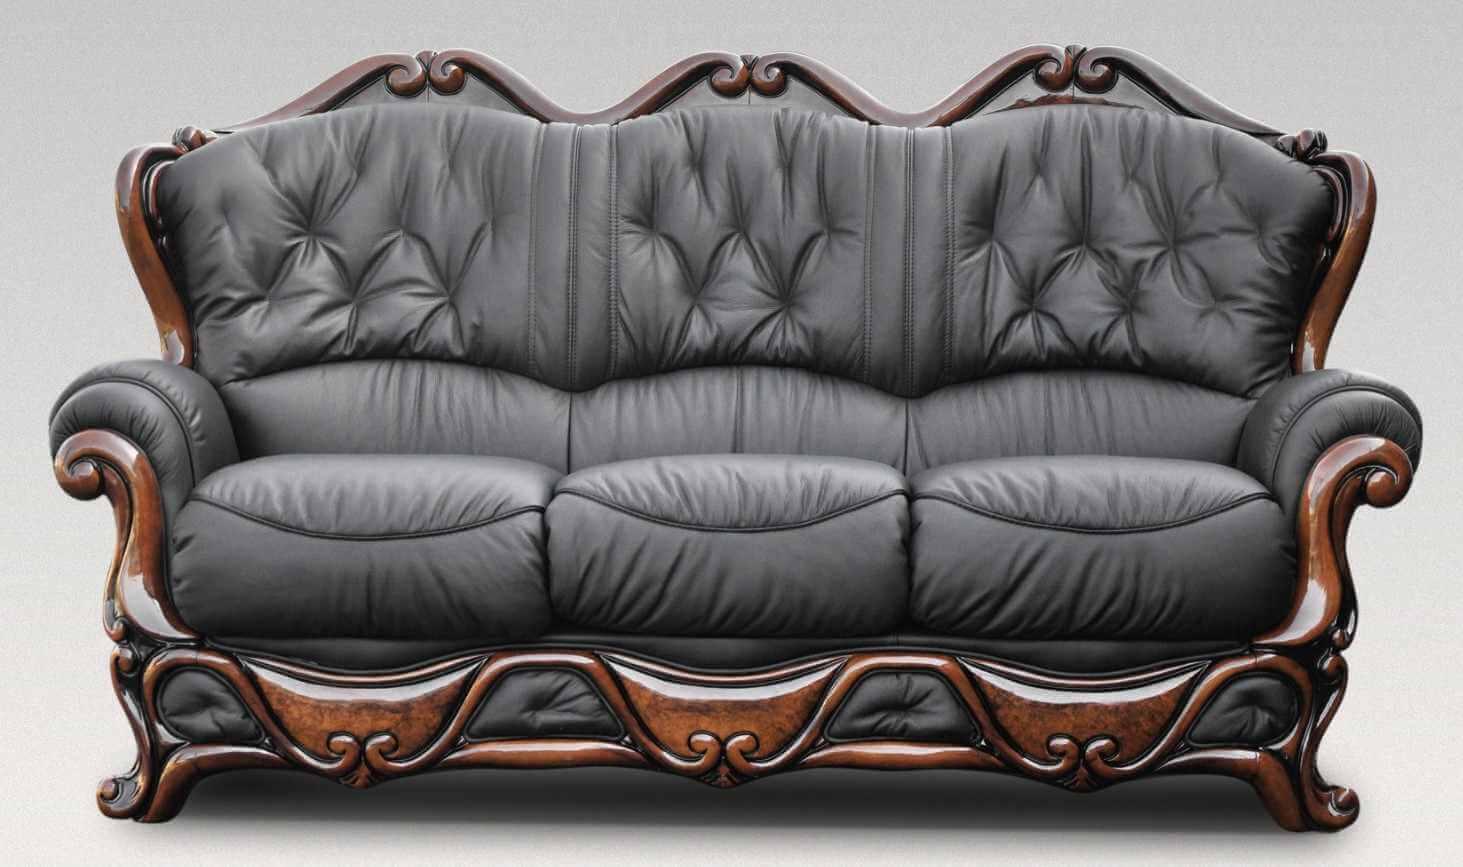 Illinois 3 Seater Italian Leather Sofa Settee Offer Black